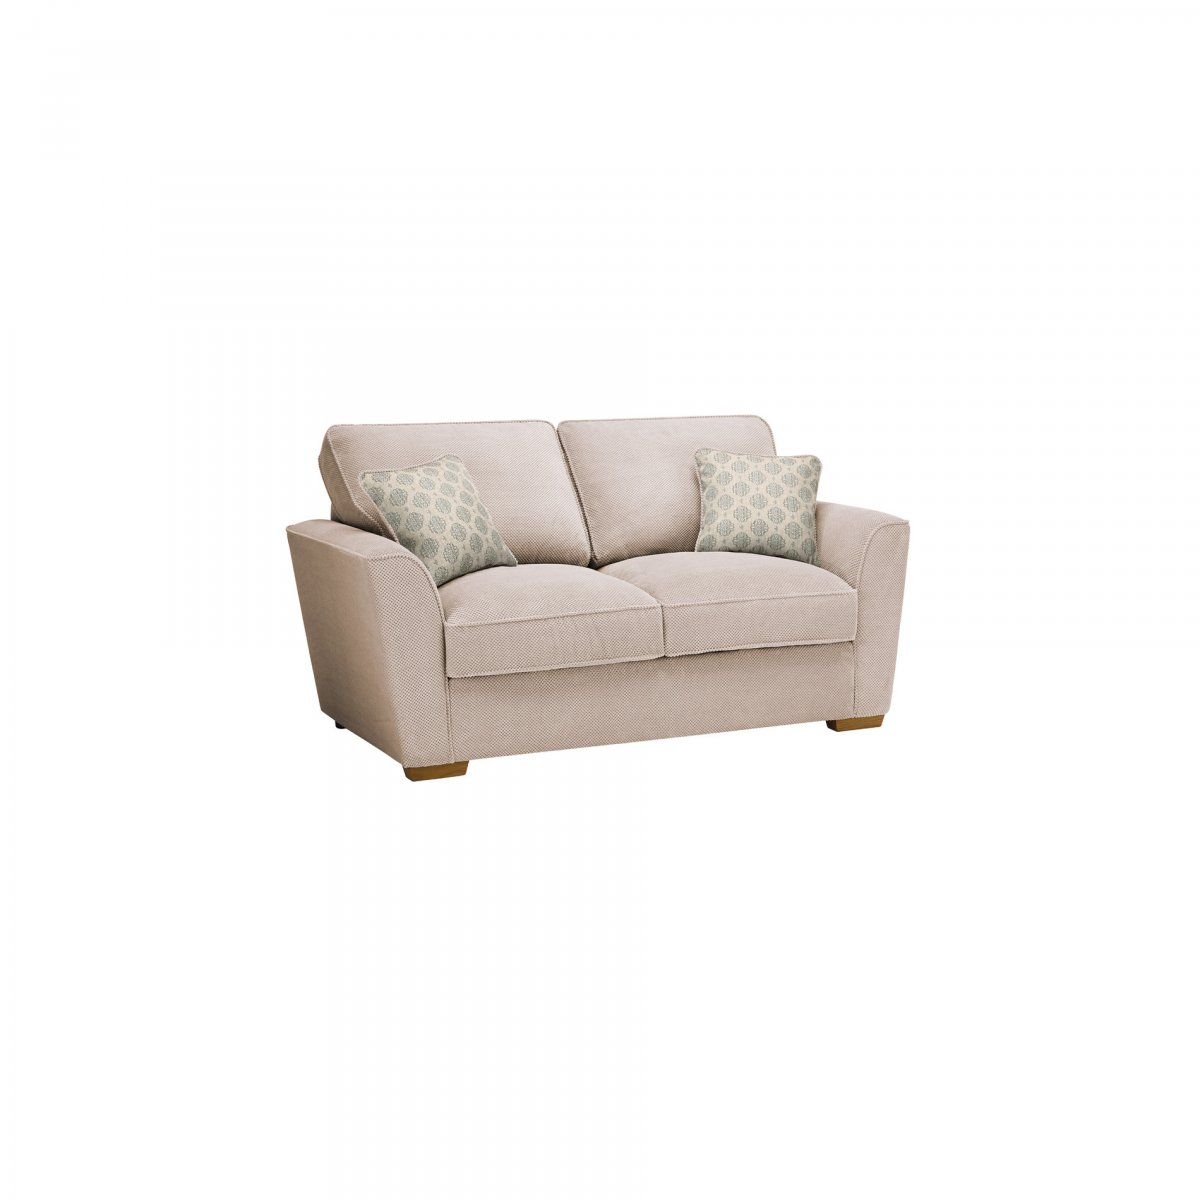 Nebraska 2 Seater Sofa Bed With Deluxe Mattress In Aero Fawn